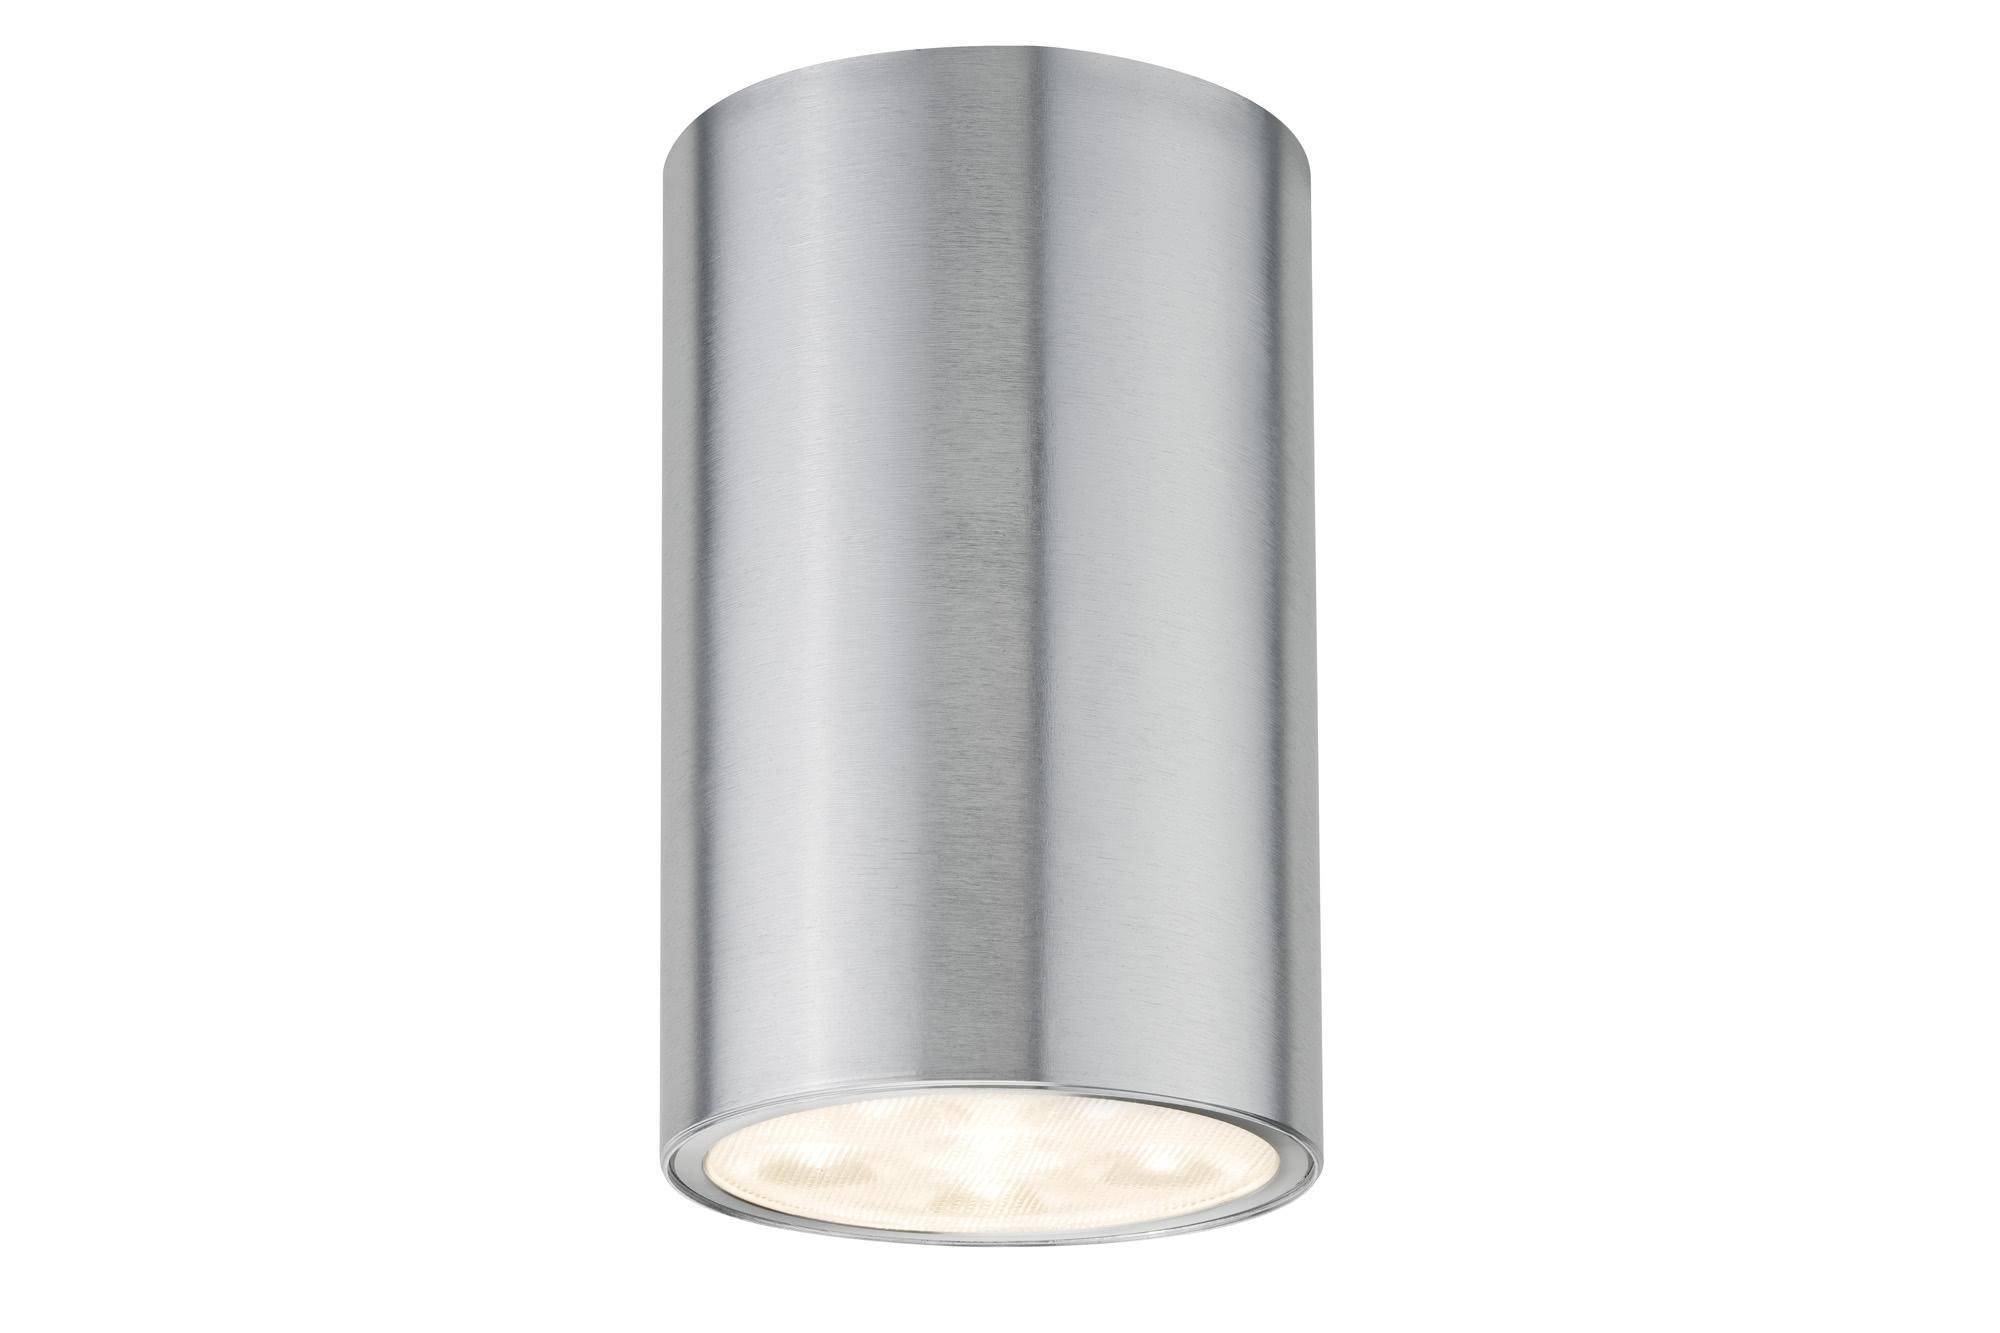 Paulmann. 92547 Светильник накладной Premium ABL Barrel rund LED 6W alu elox